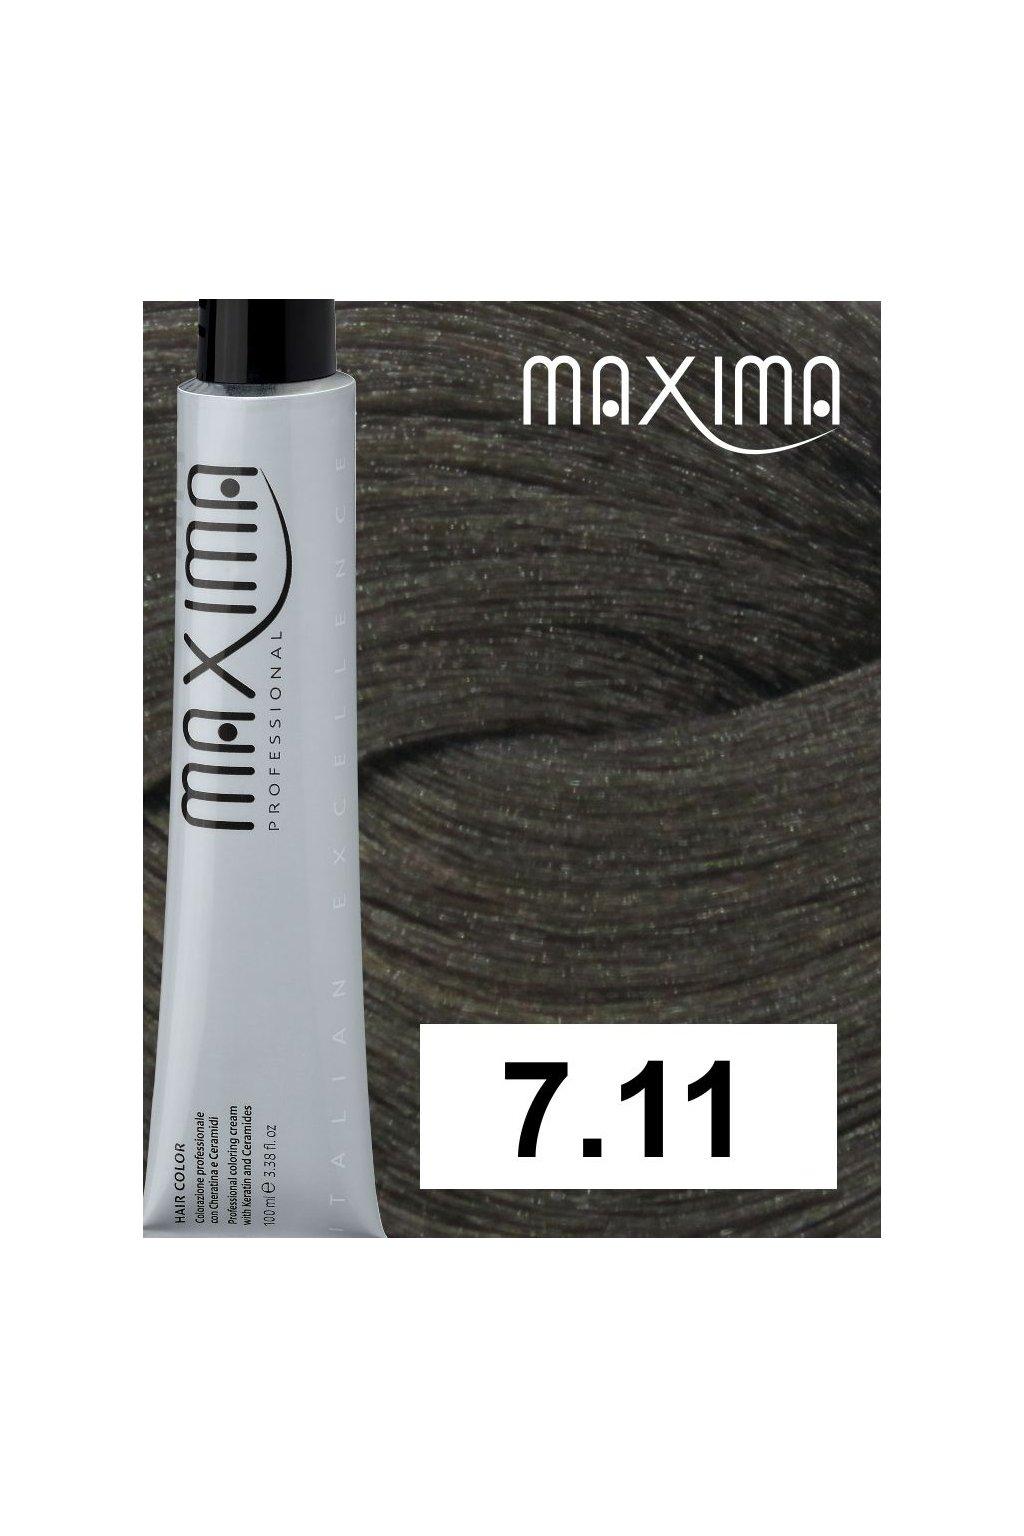 7 11 max